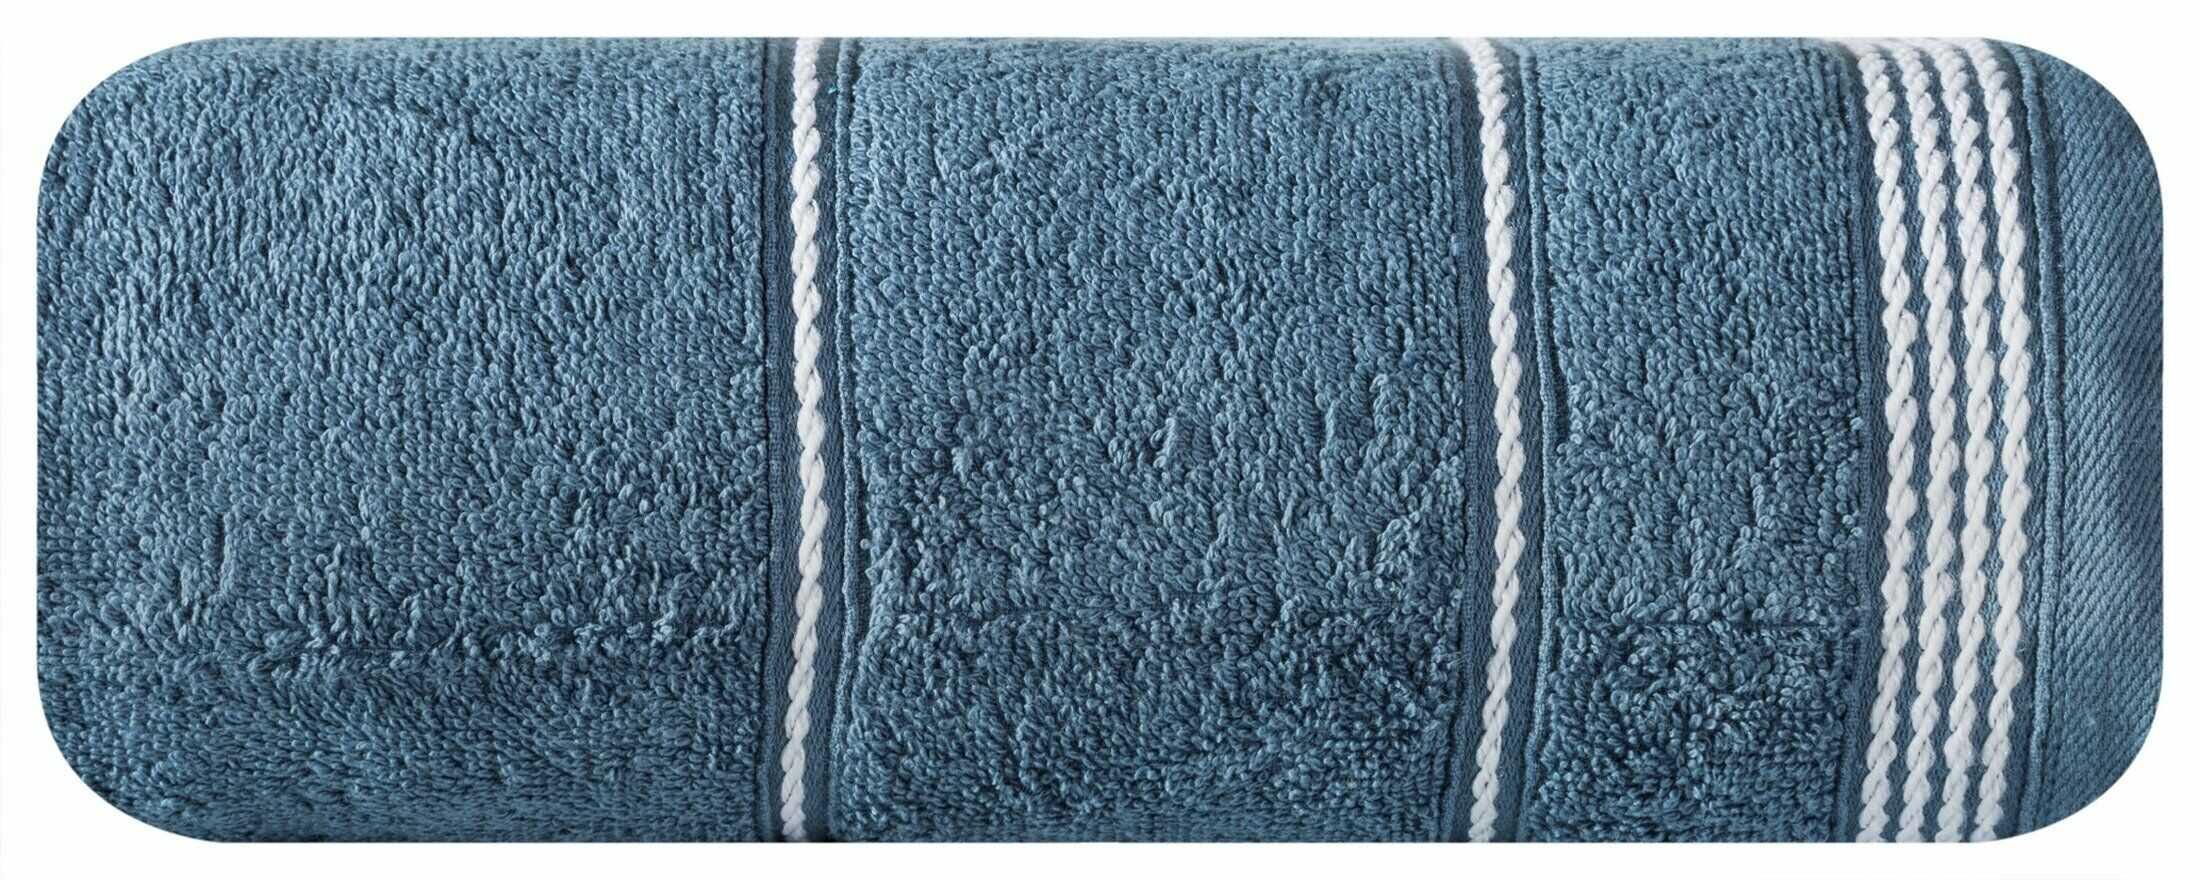 Ręcznik Mira 30x50 niebieski ciemny 10 frotte 500 g/m2 Eurofirany